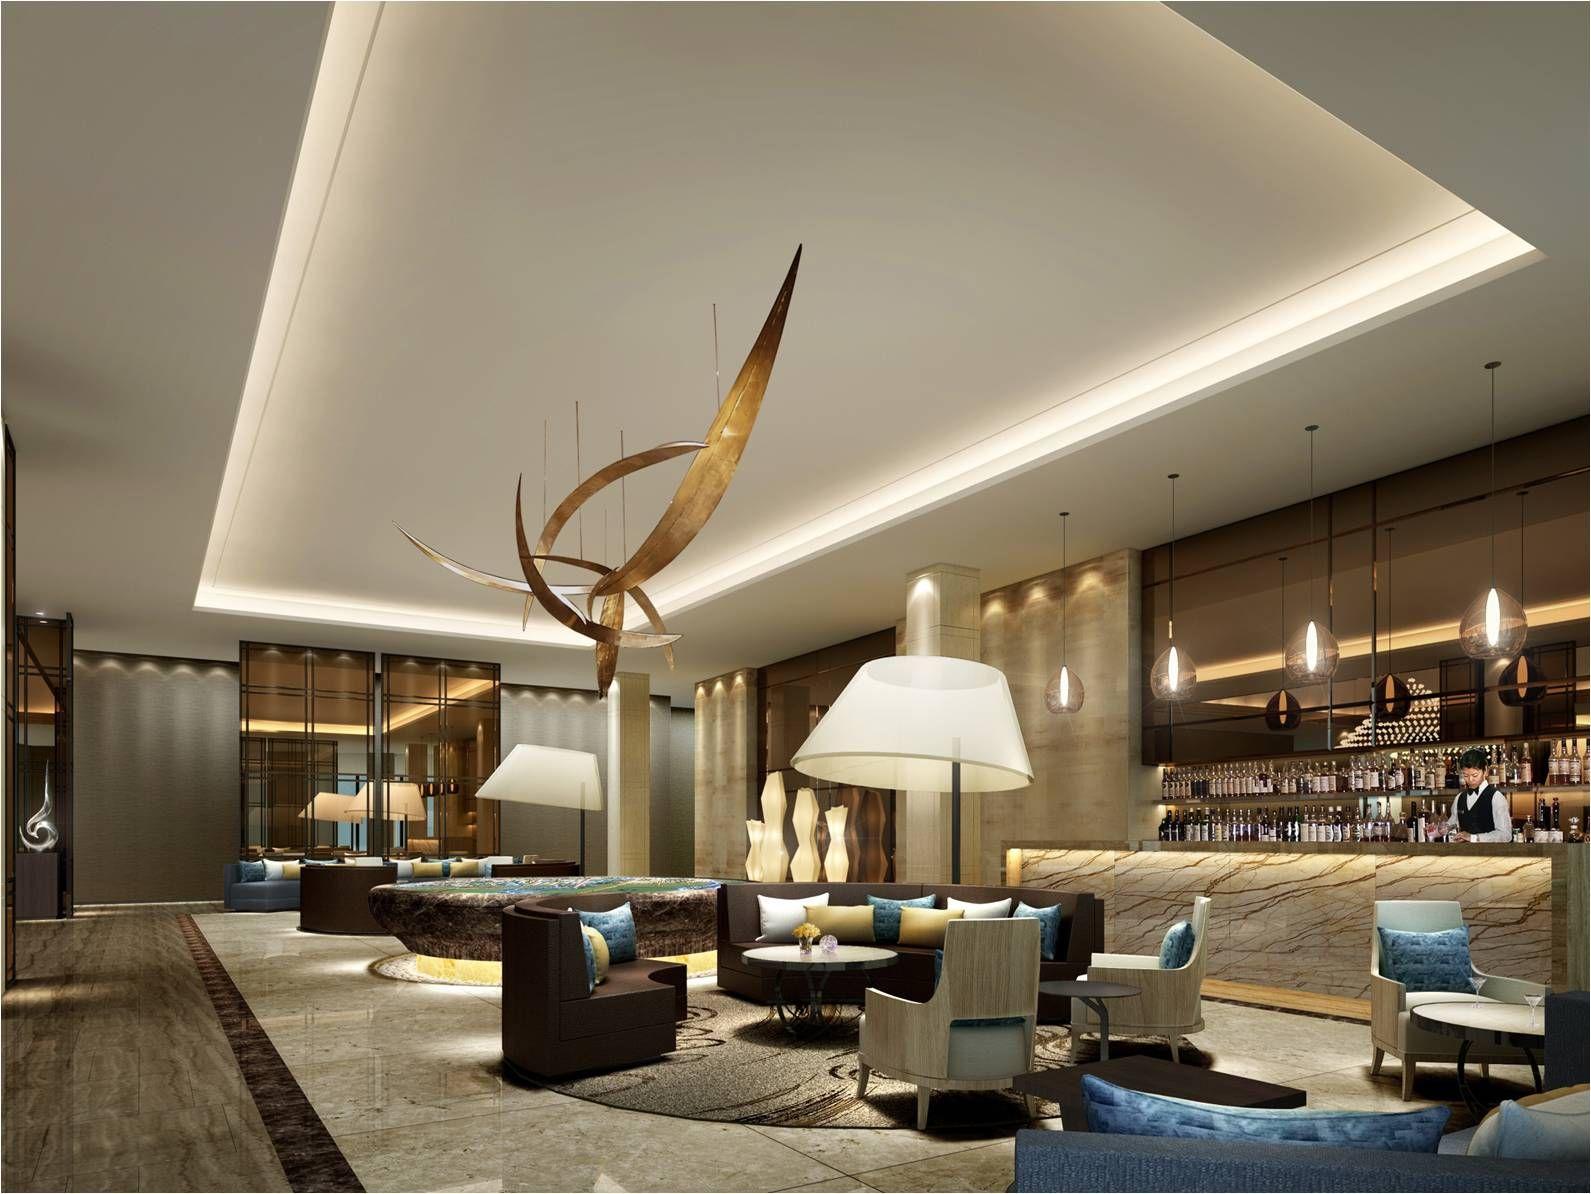 Ccd-cheng Chung Design Hk Hotel Interiors